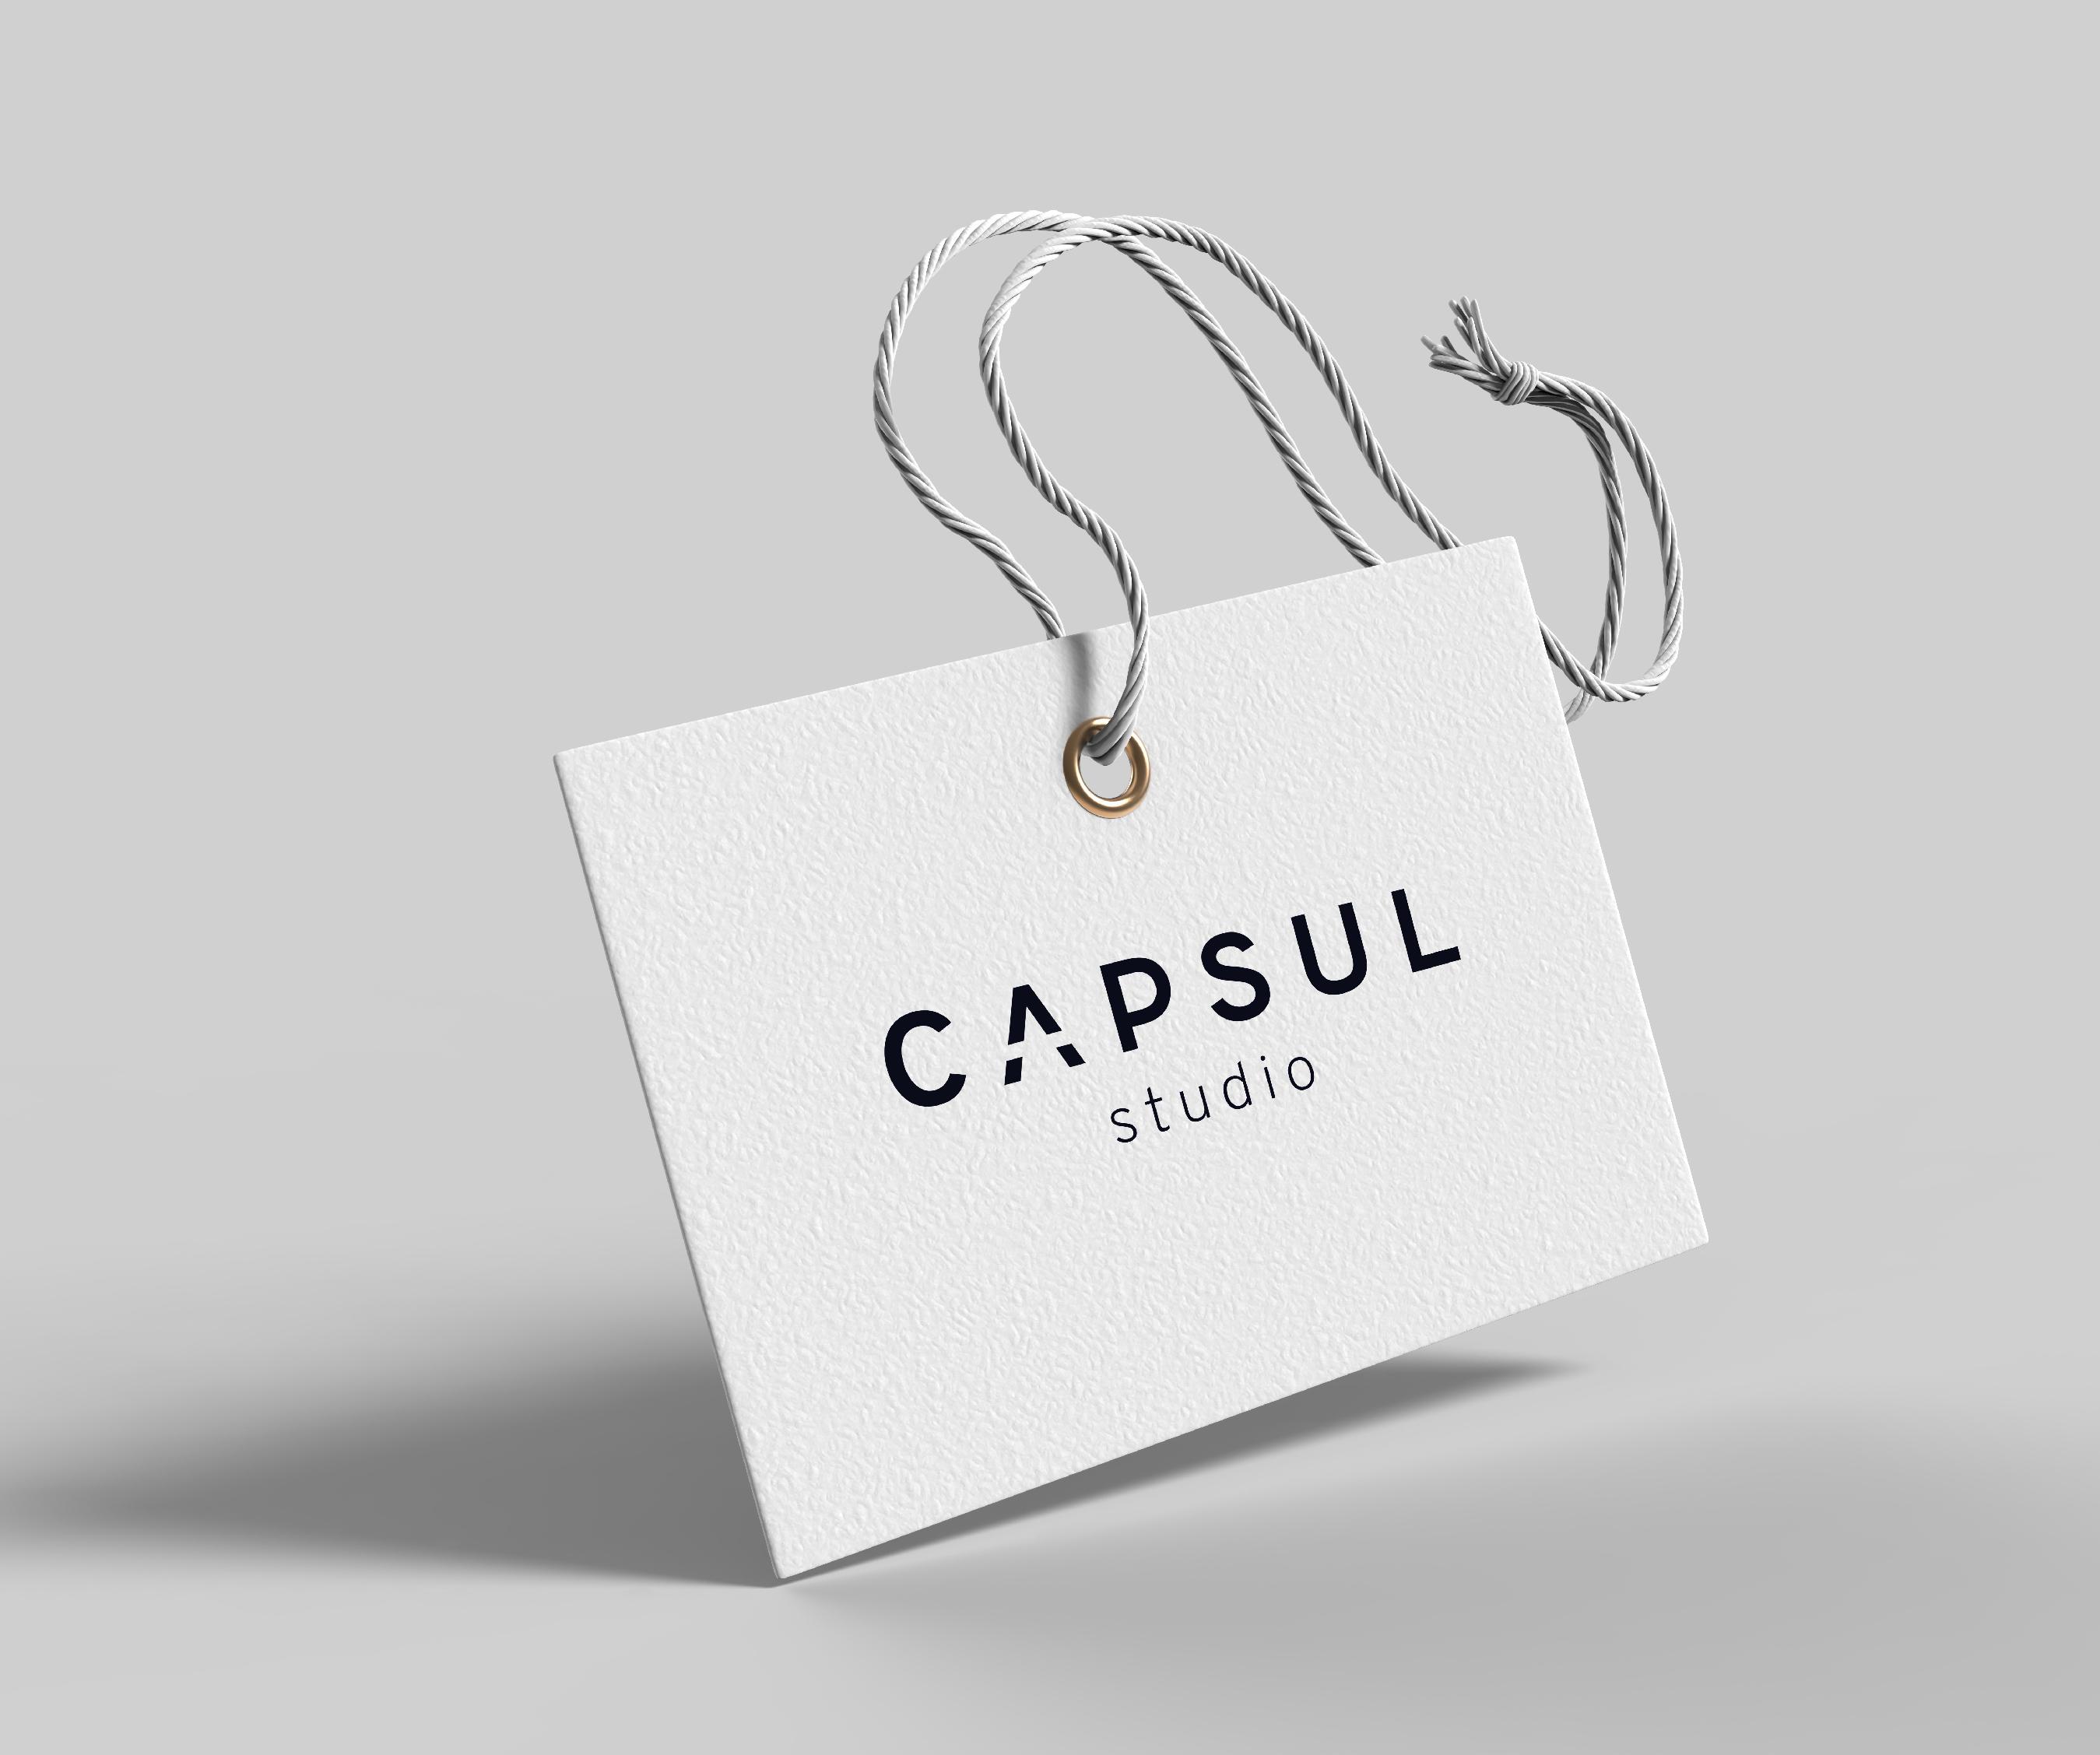 CAPSUL_MOCKUP-13